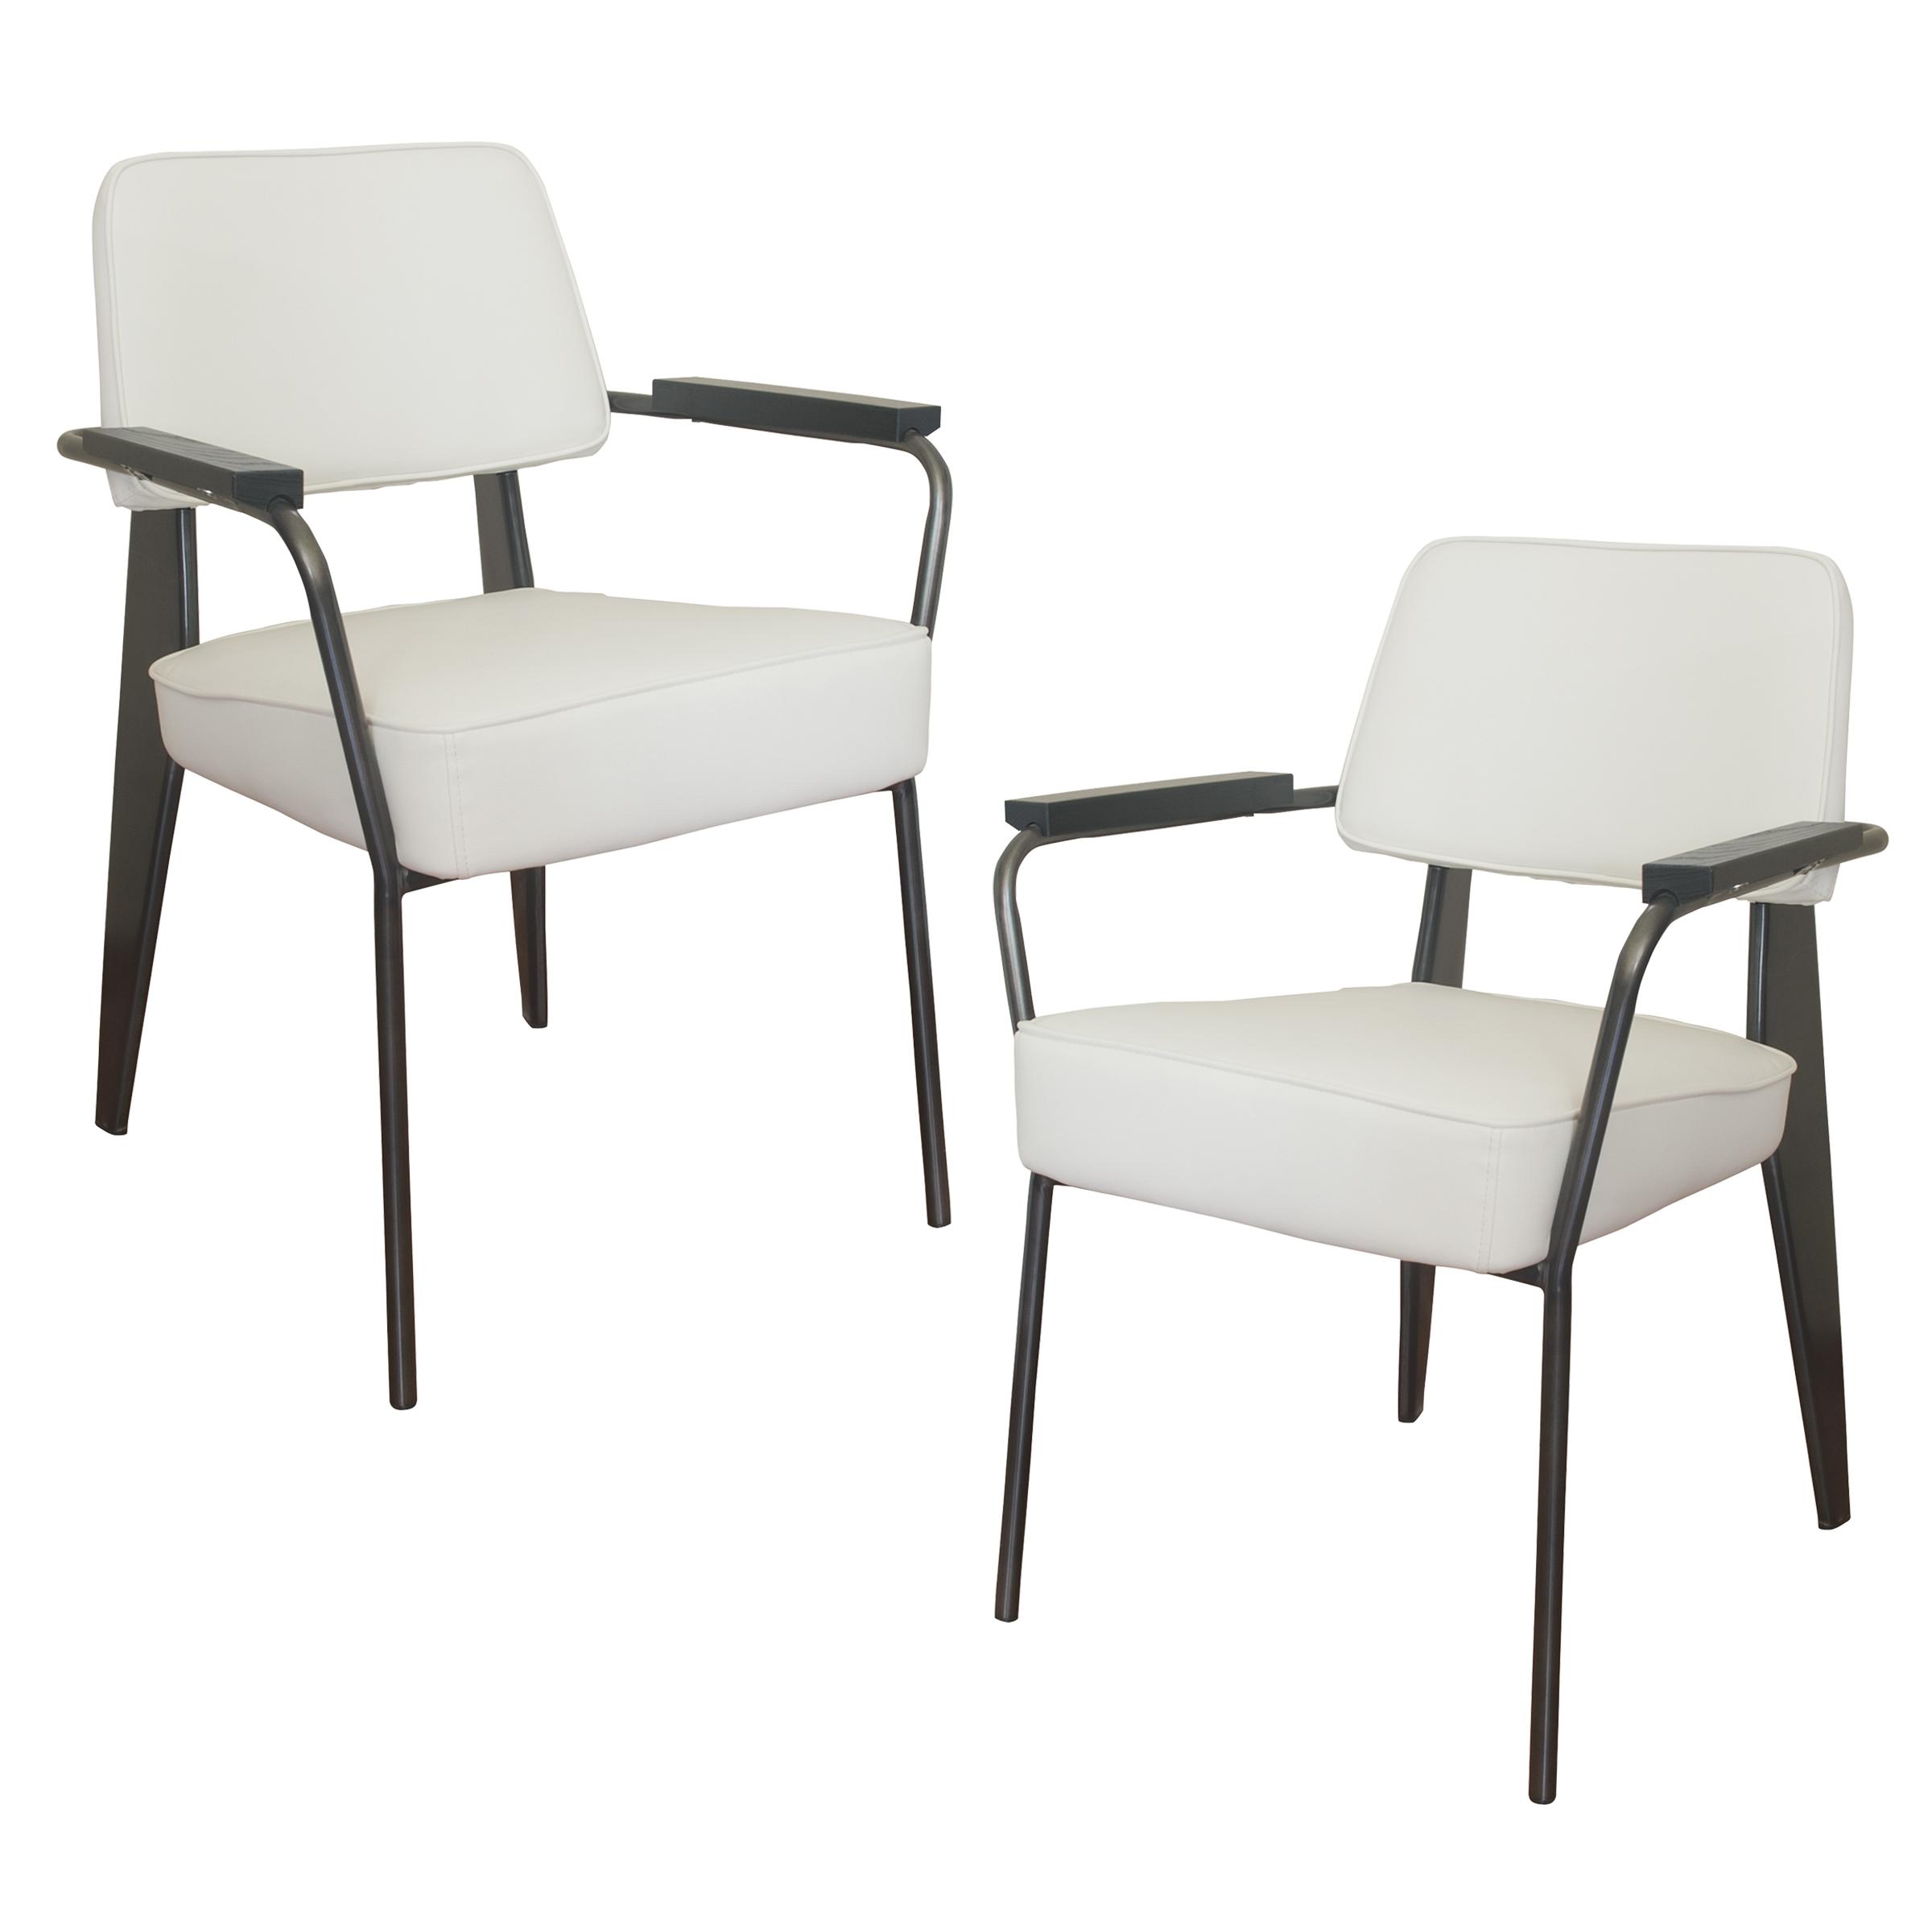 Fauteuil Direction Accent Chair - 2 Piece Set - White